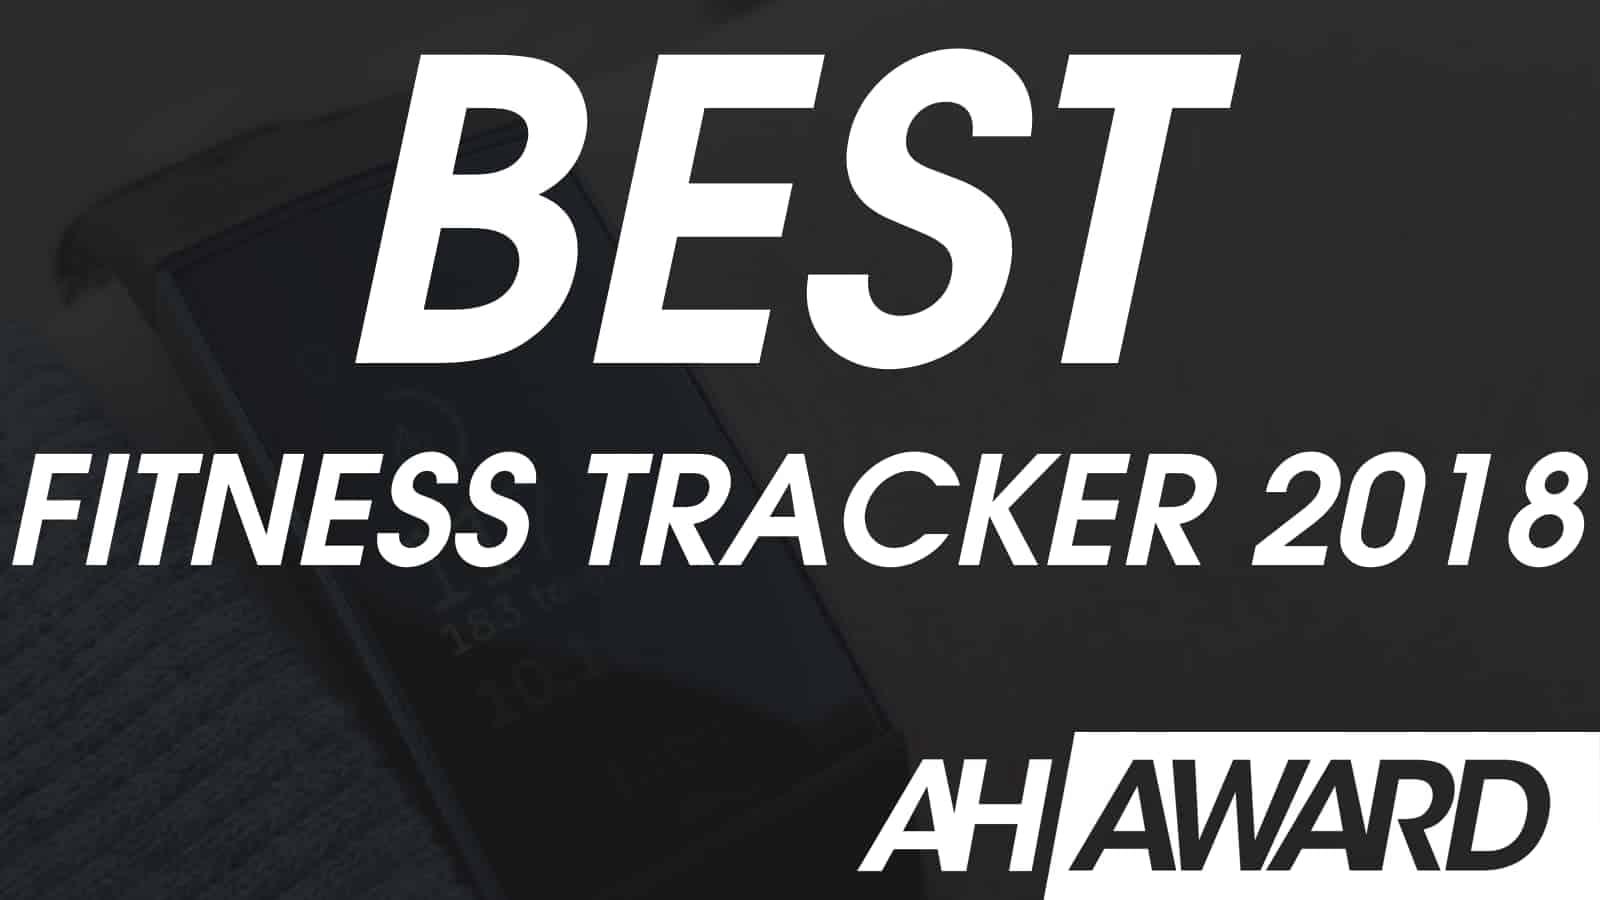 ANDROID HEADLINES AWARDS FITNESS TRACKER 2018